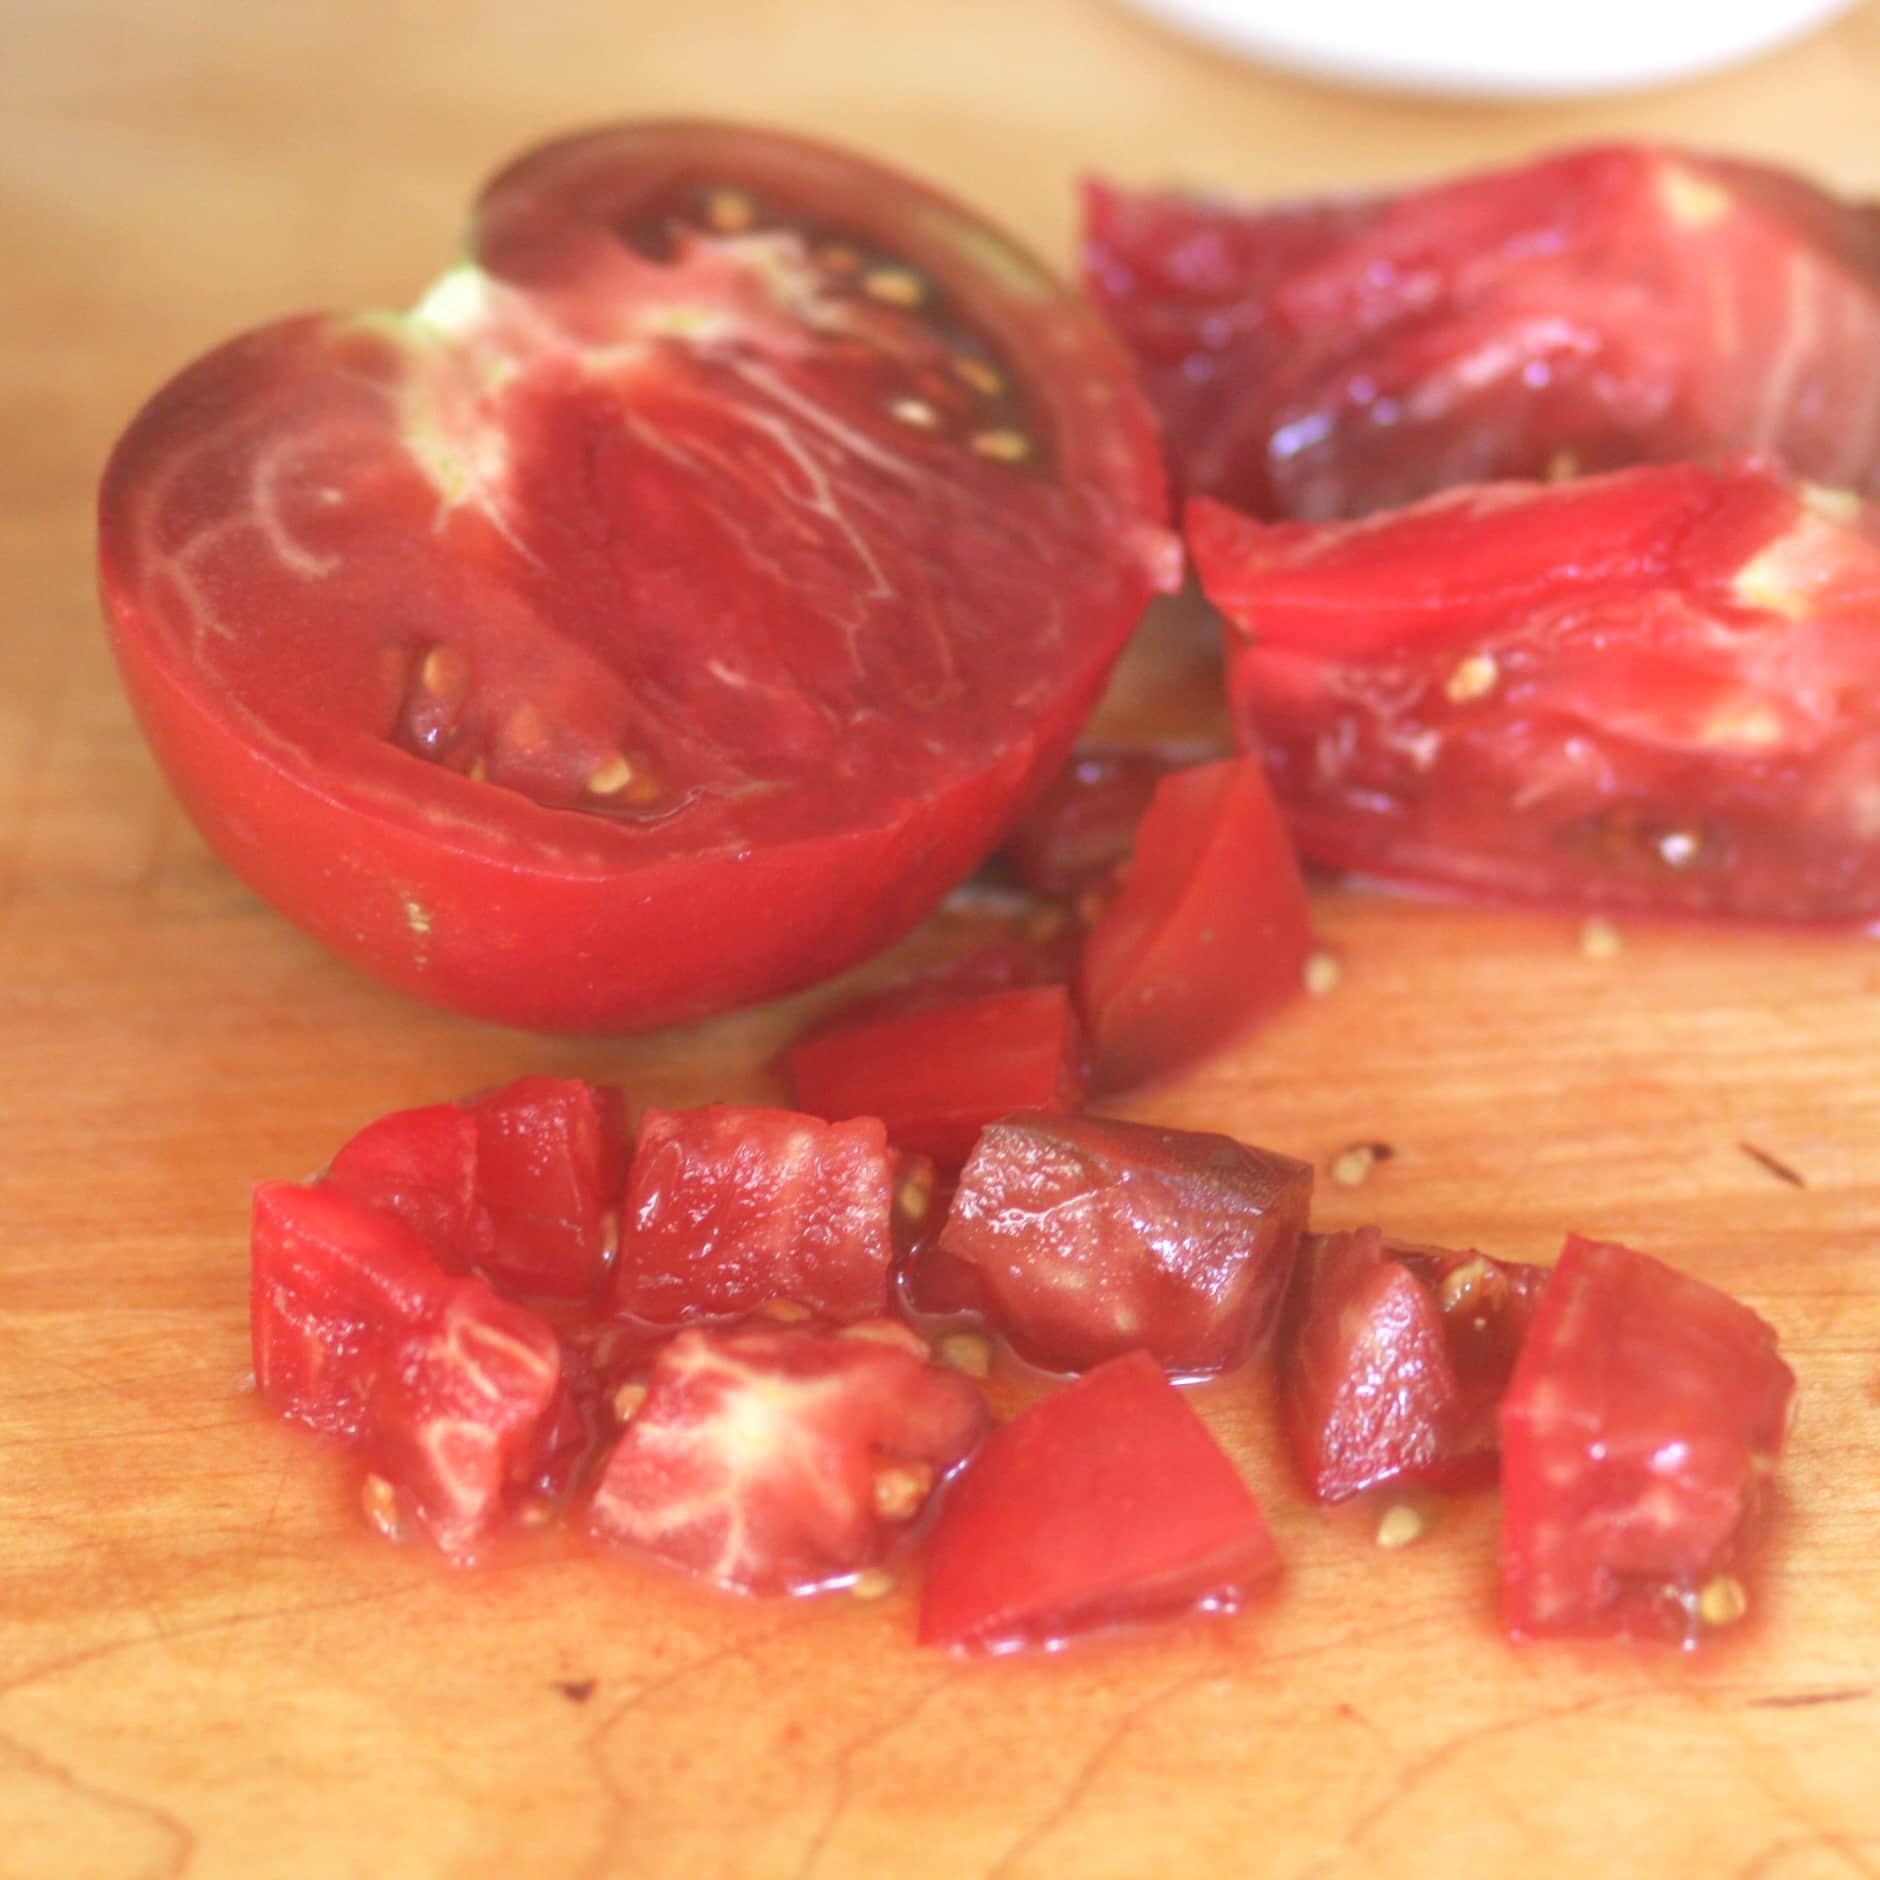 How To Make Pico de Gallo (Salsa Fresca): gallery image 7